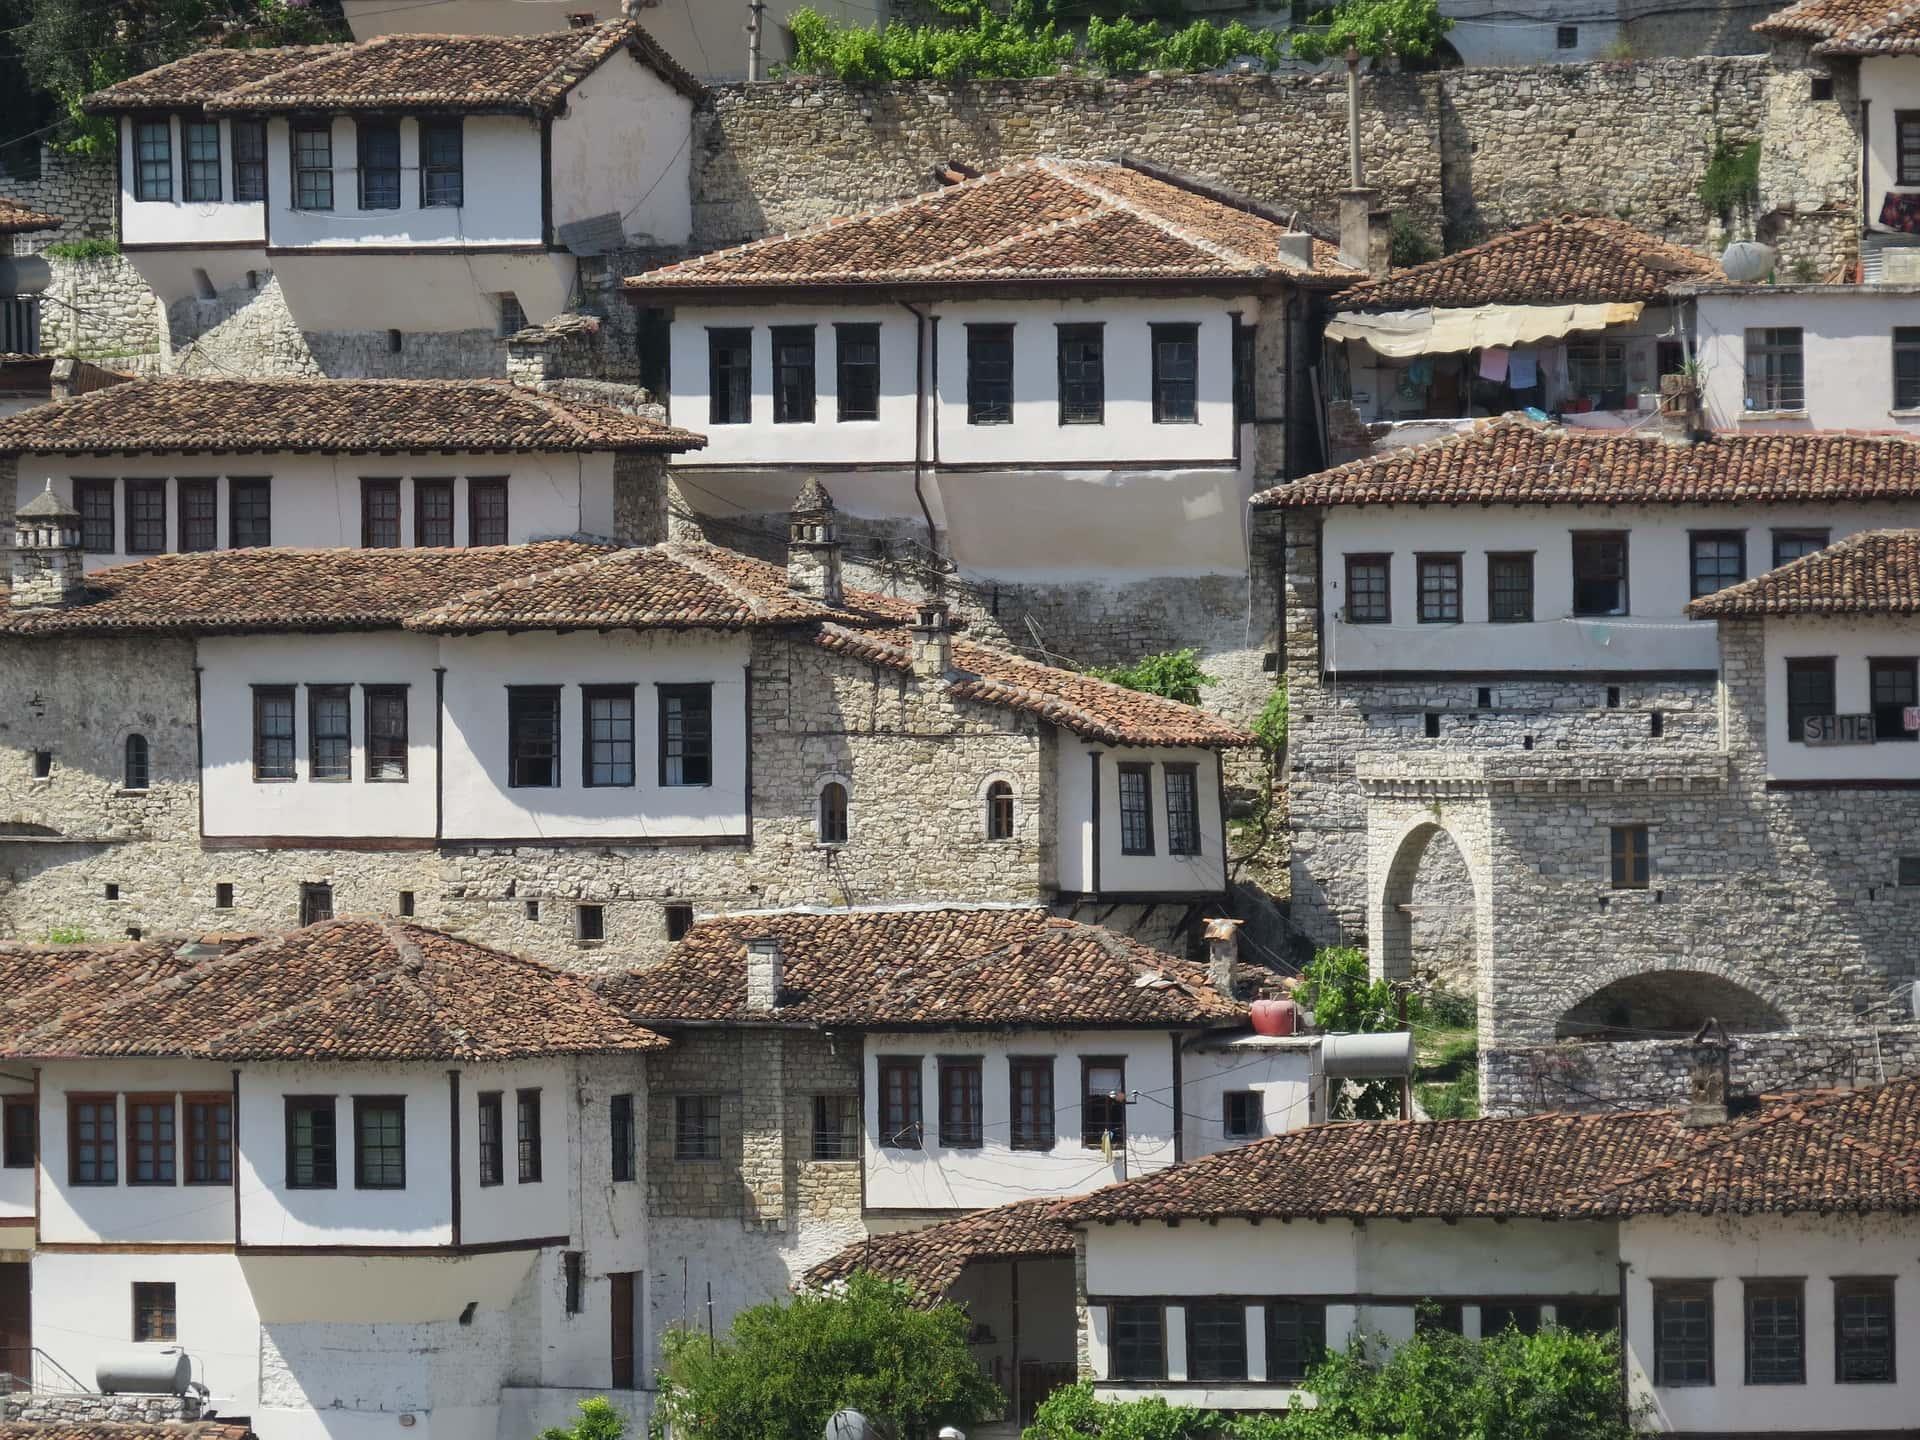 albanien-reise-stadt